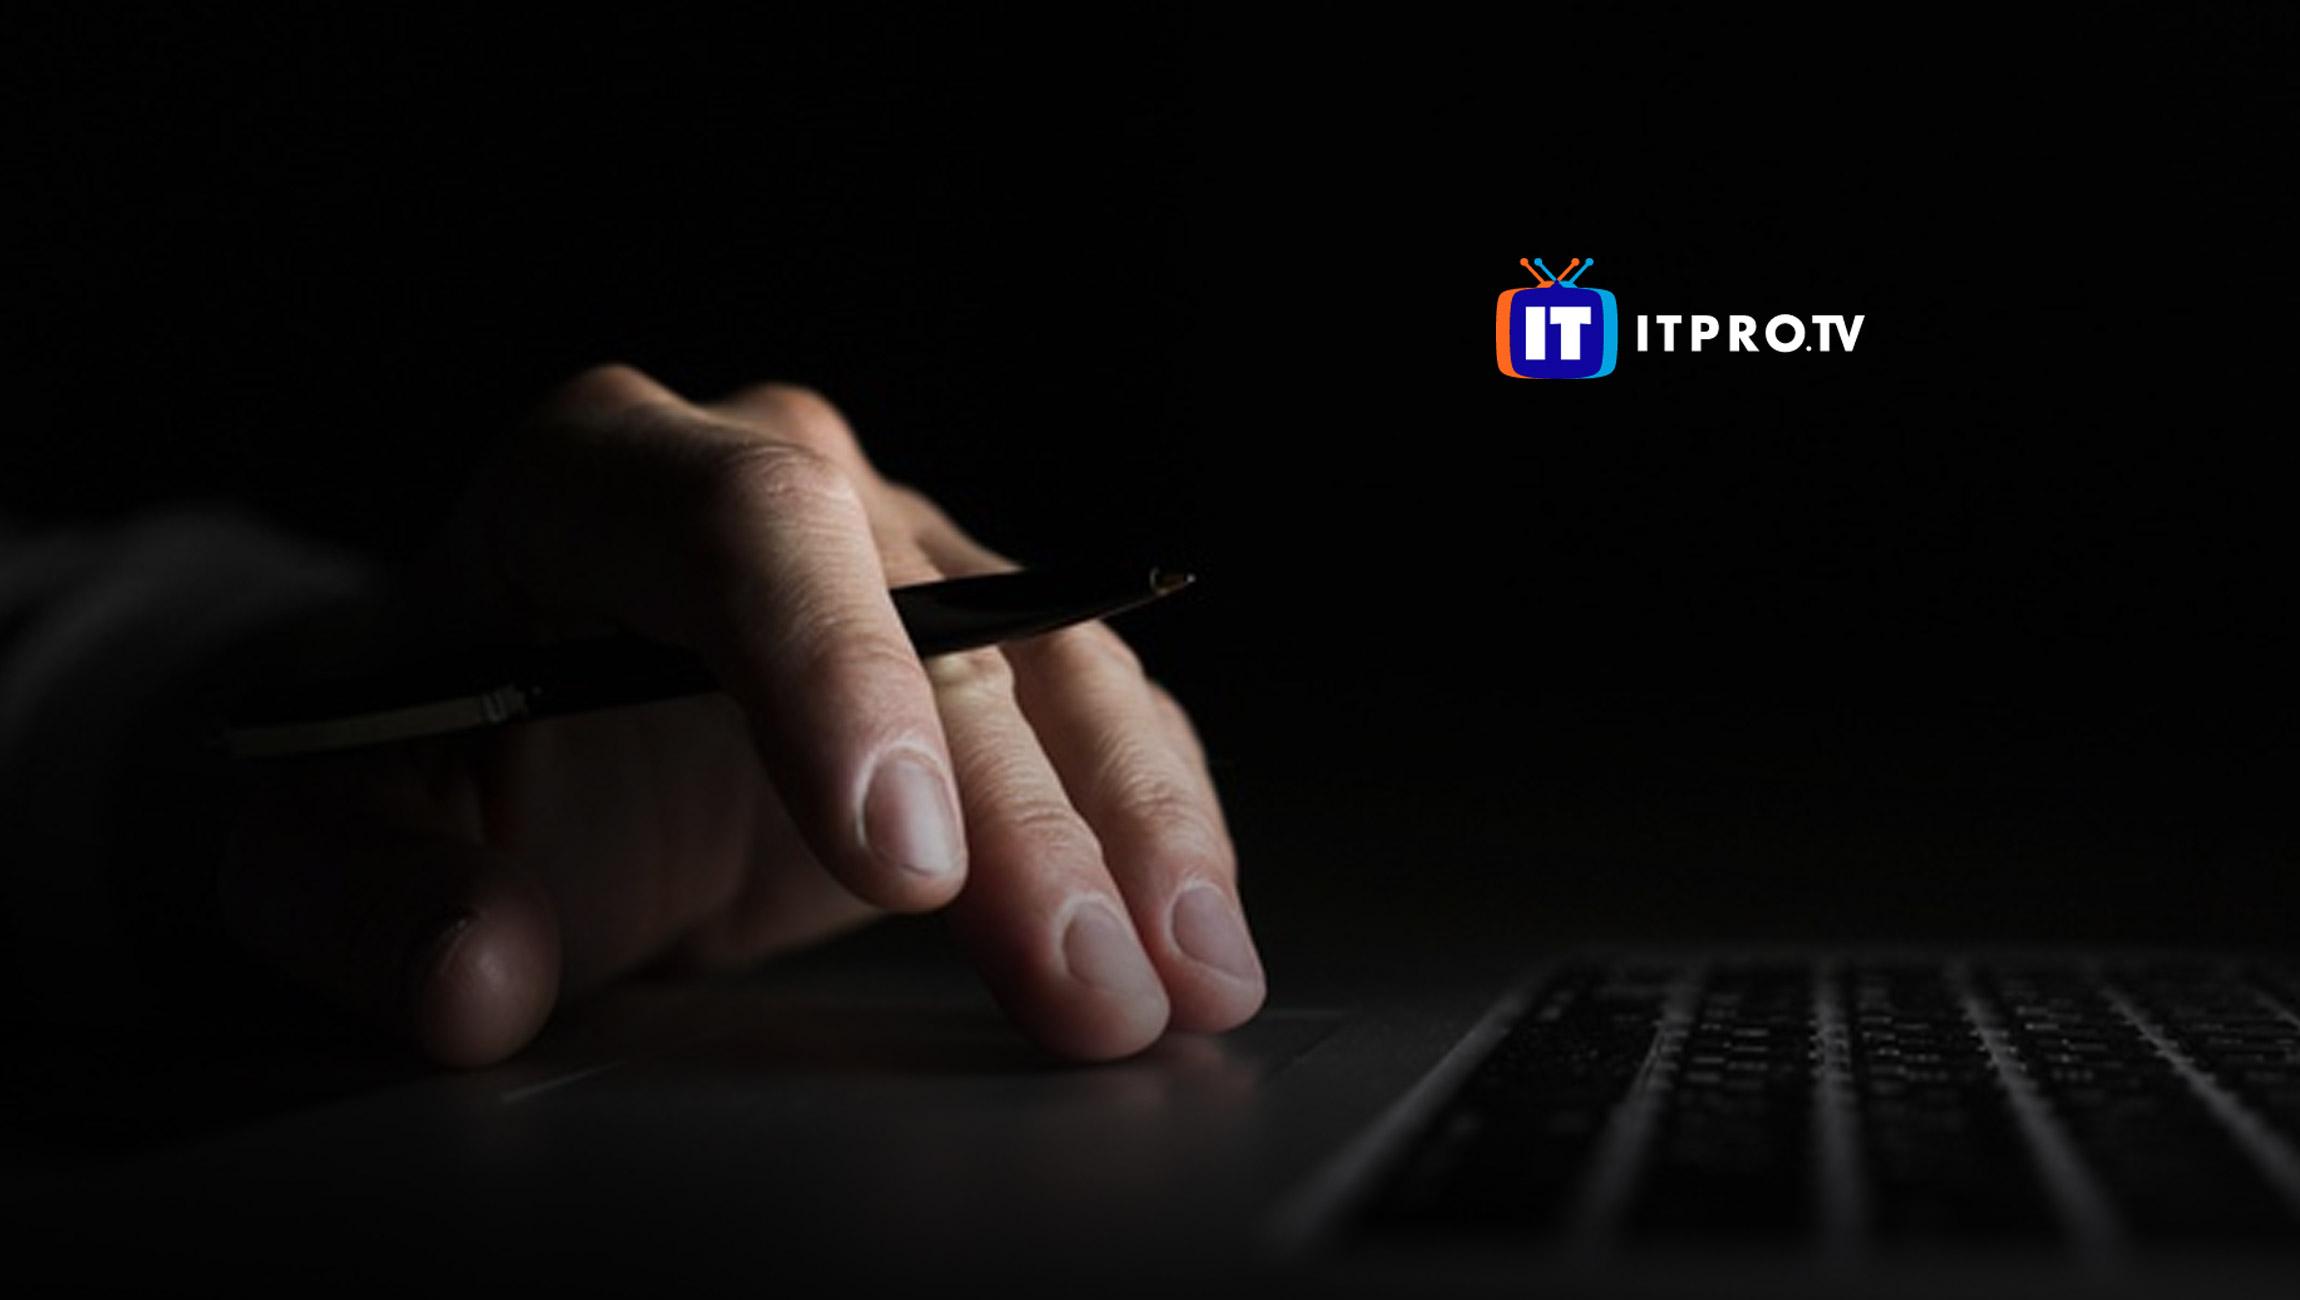 ITProTV Courses Now Available on MeasureUp Platform